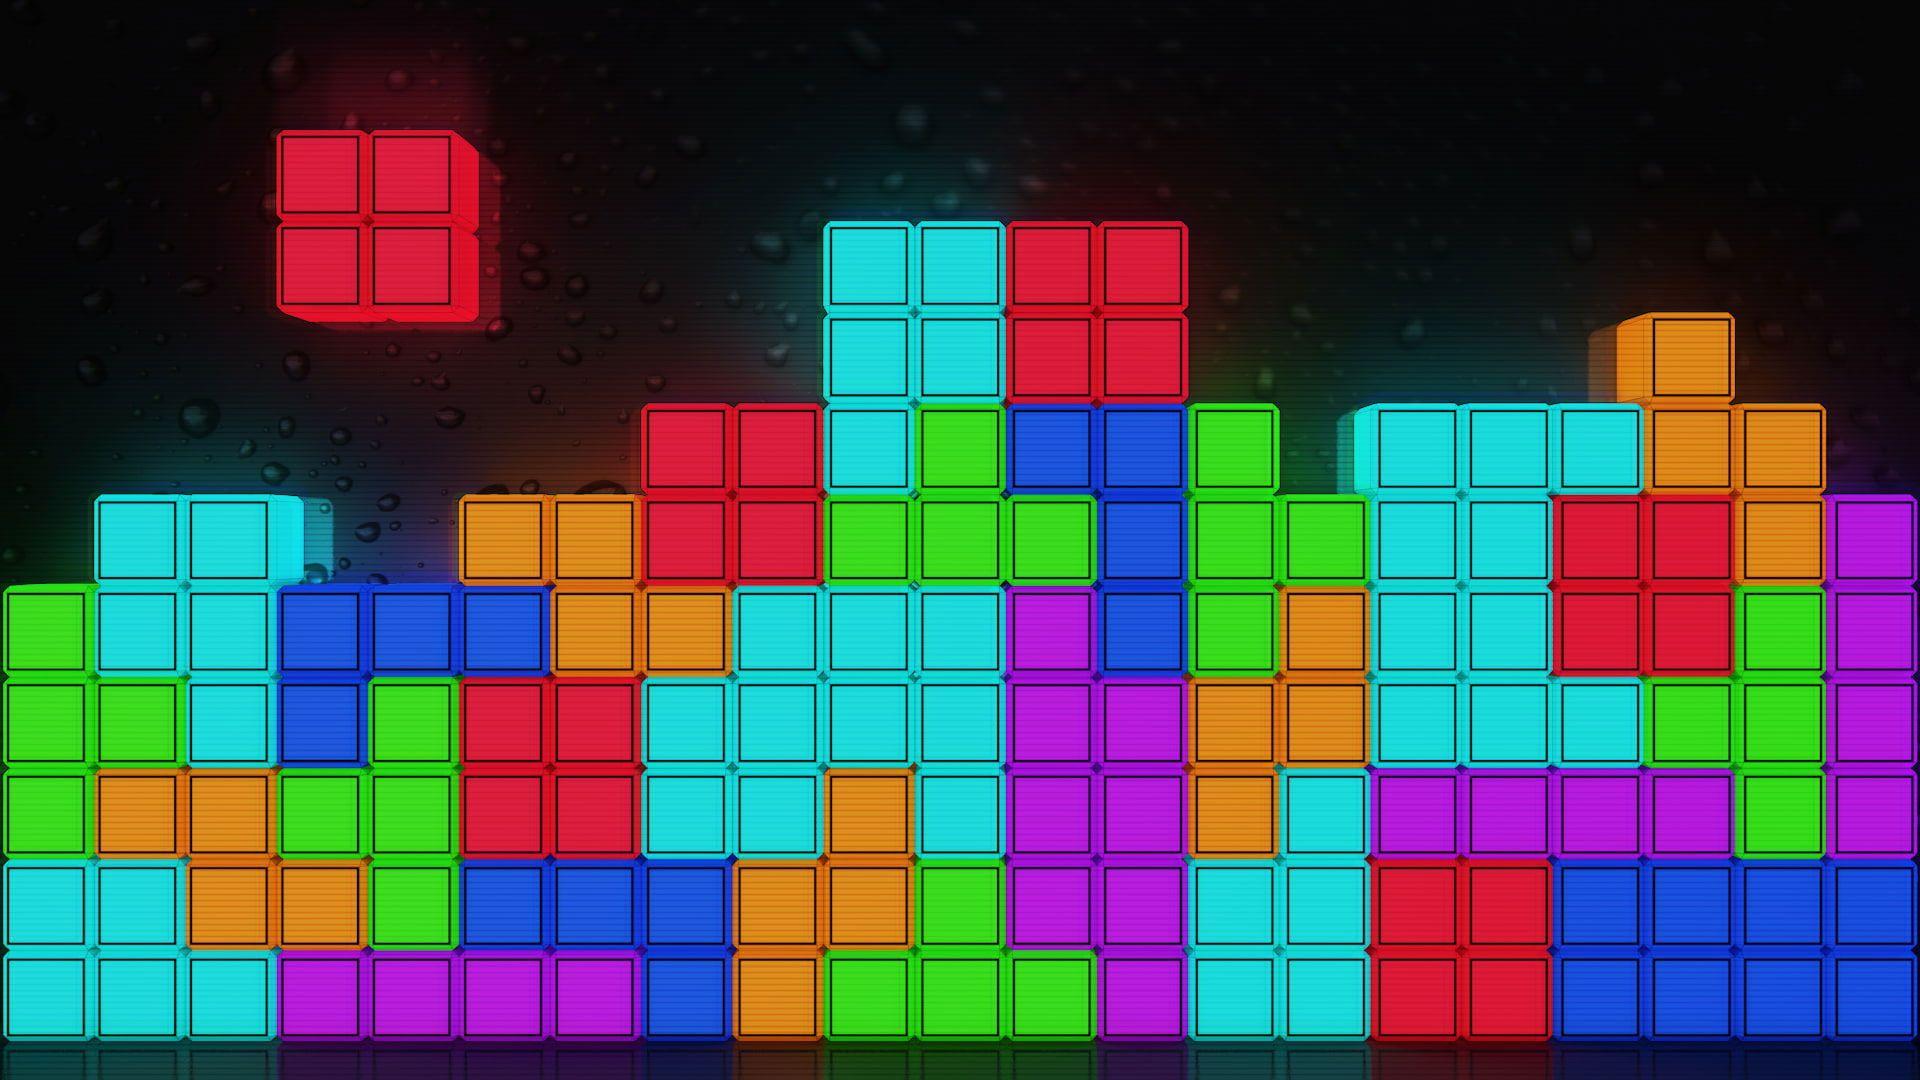 Colorful Portrait Display Retro Games Simple Square Tetris Video Games Vintage 1080p Wallpaper Hdwa Iphone Wallpaper Mobile Wallpaper Minimal Wallpaper